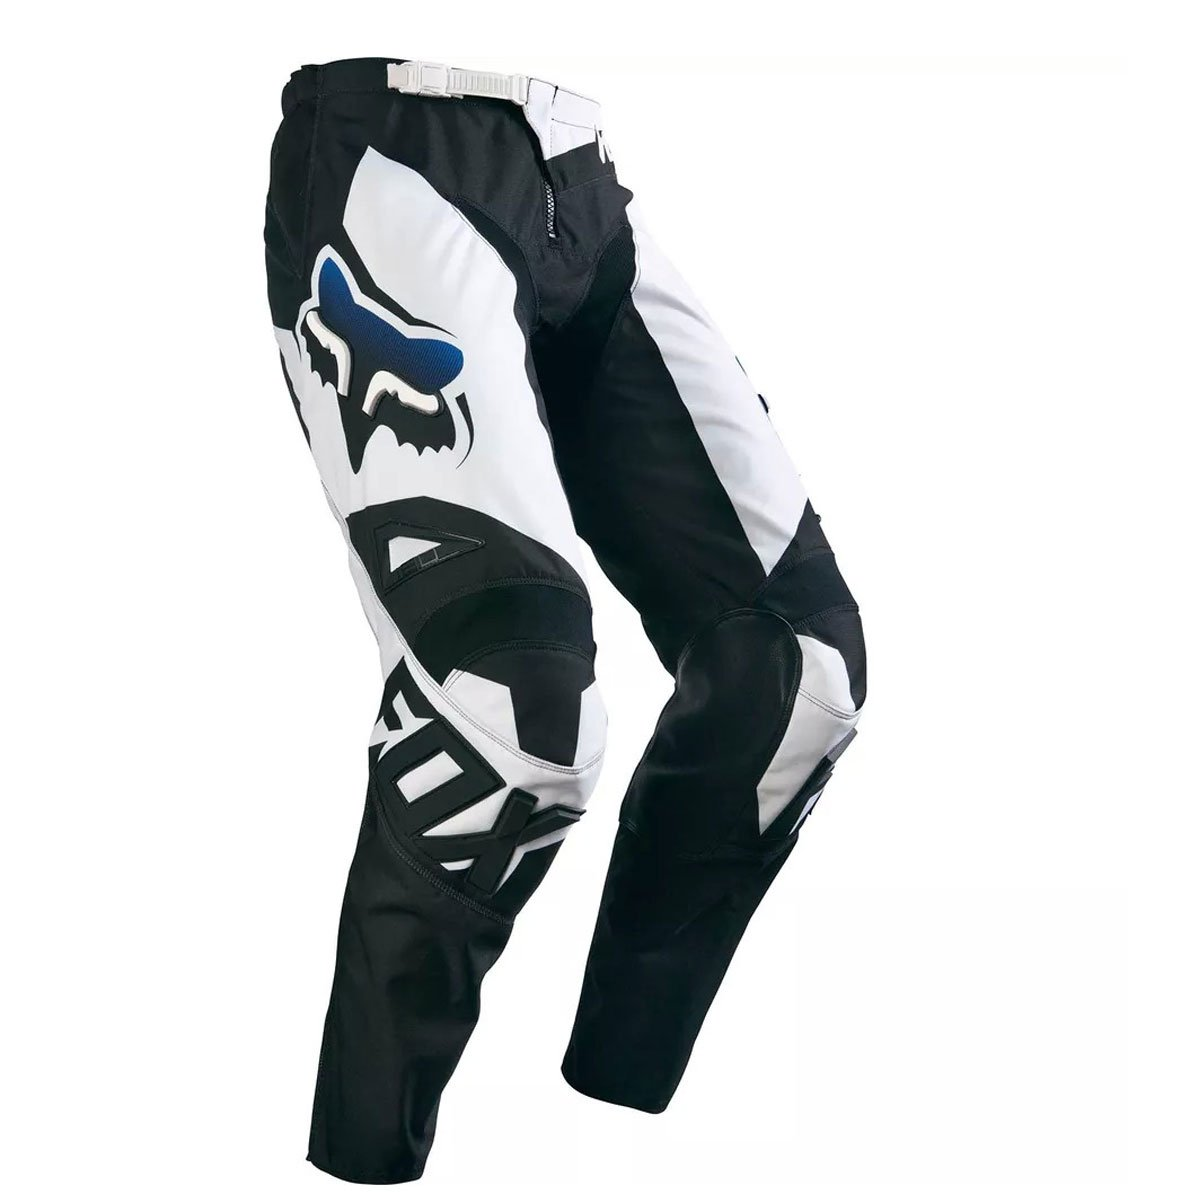 Calca de Motocross Fox 180 Race 16 Black